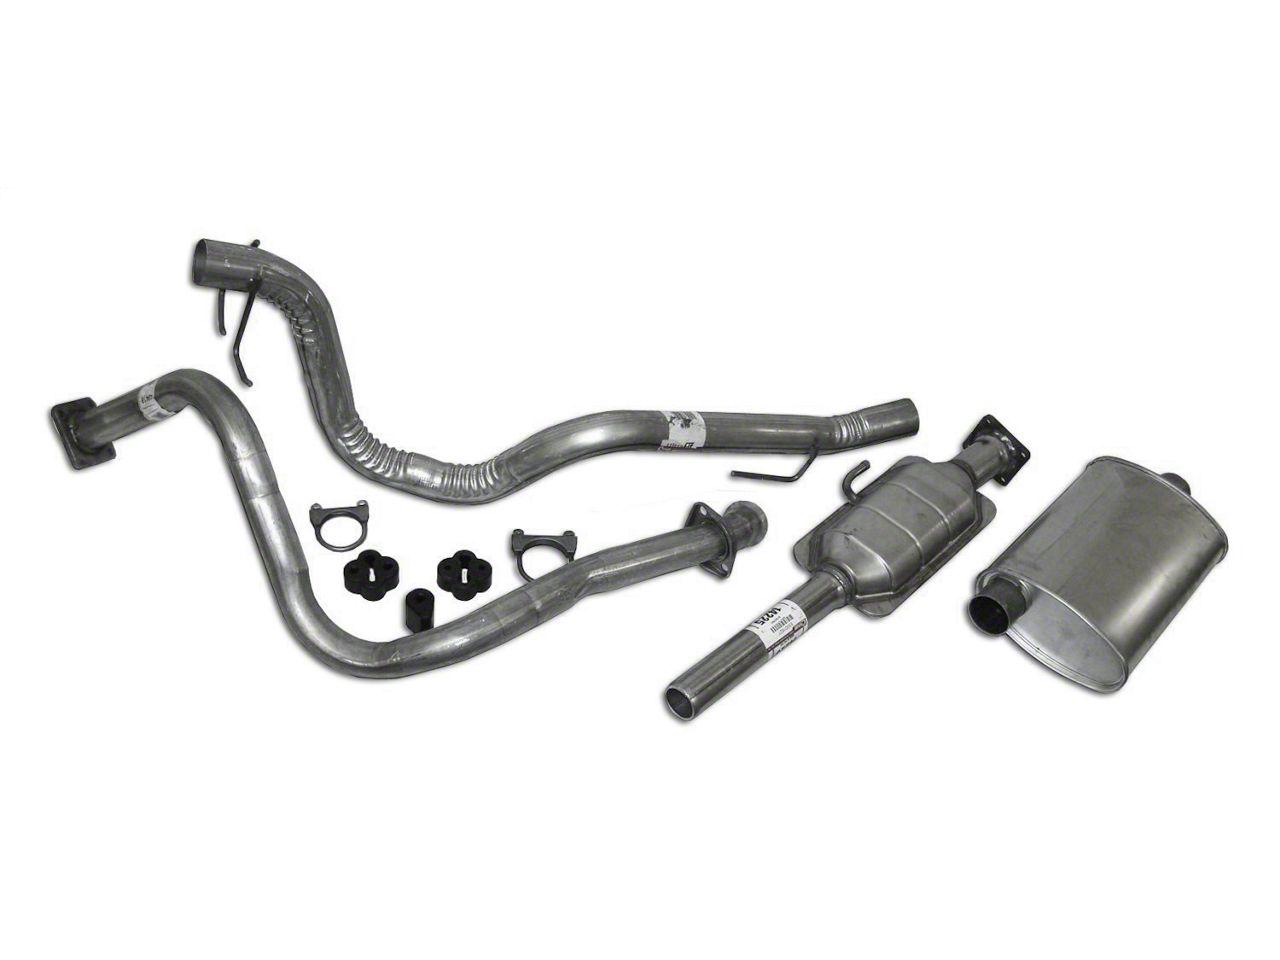 Crown Automotive Complete OEM Exhaust Kit (87-90 4.2L Jeep Wrangler YJ)